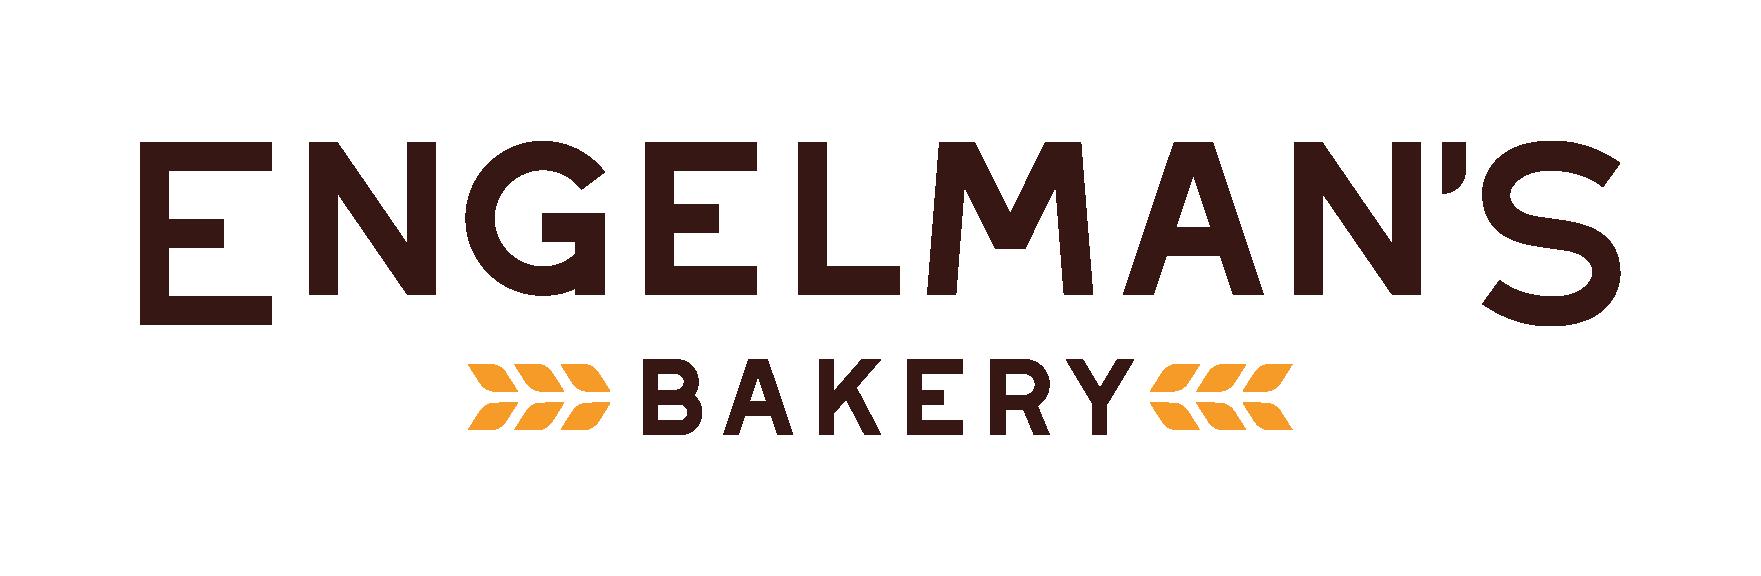 Engelman's Bakery